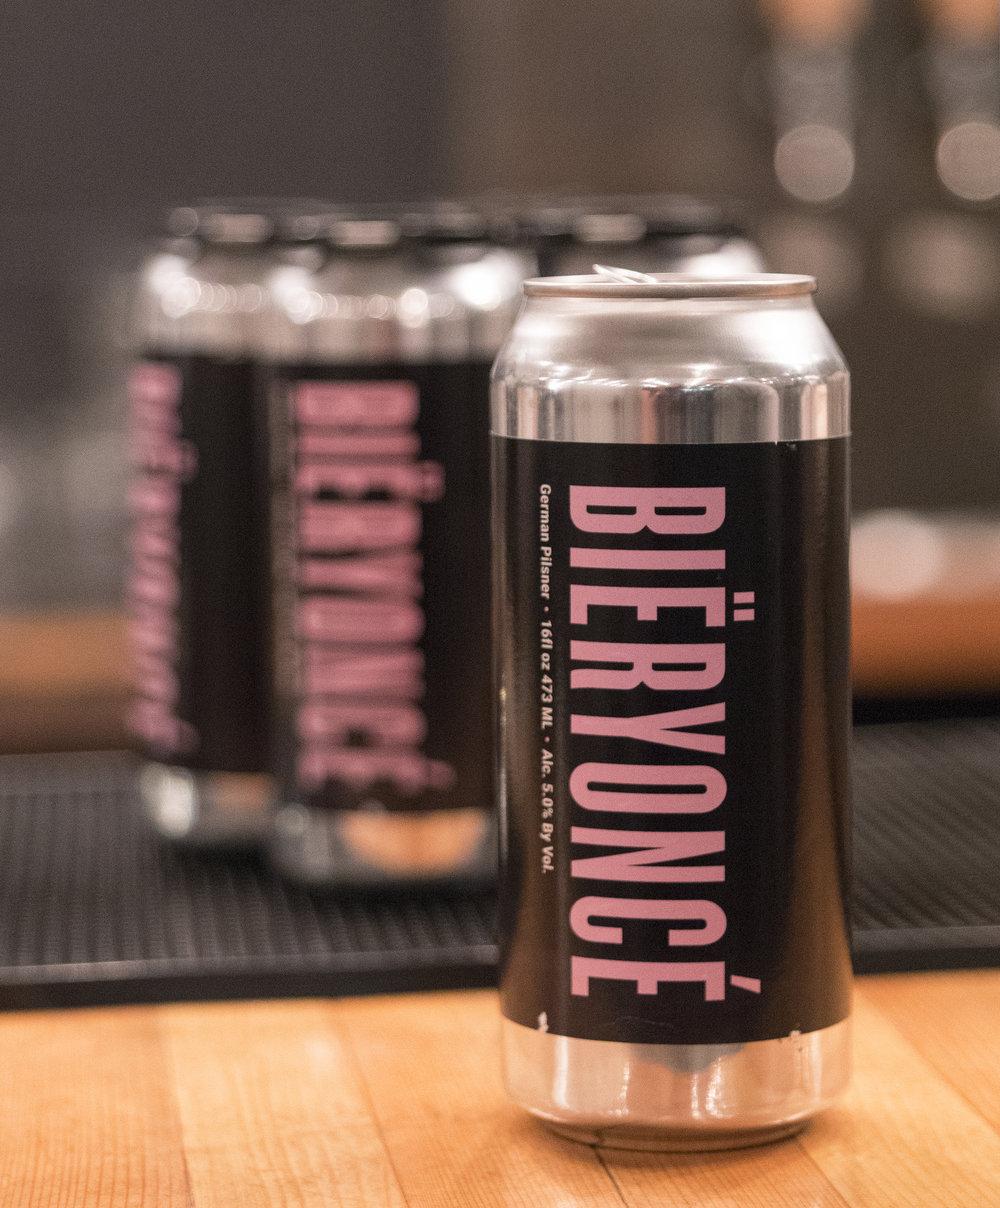 $16 - 4-Pack of Bieryonce Cans